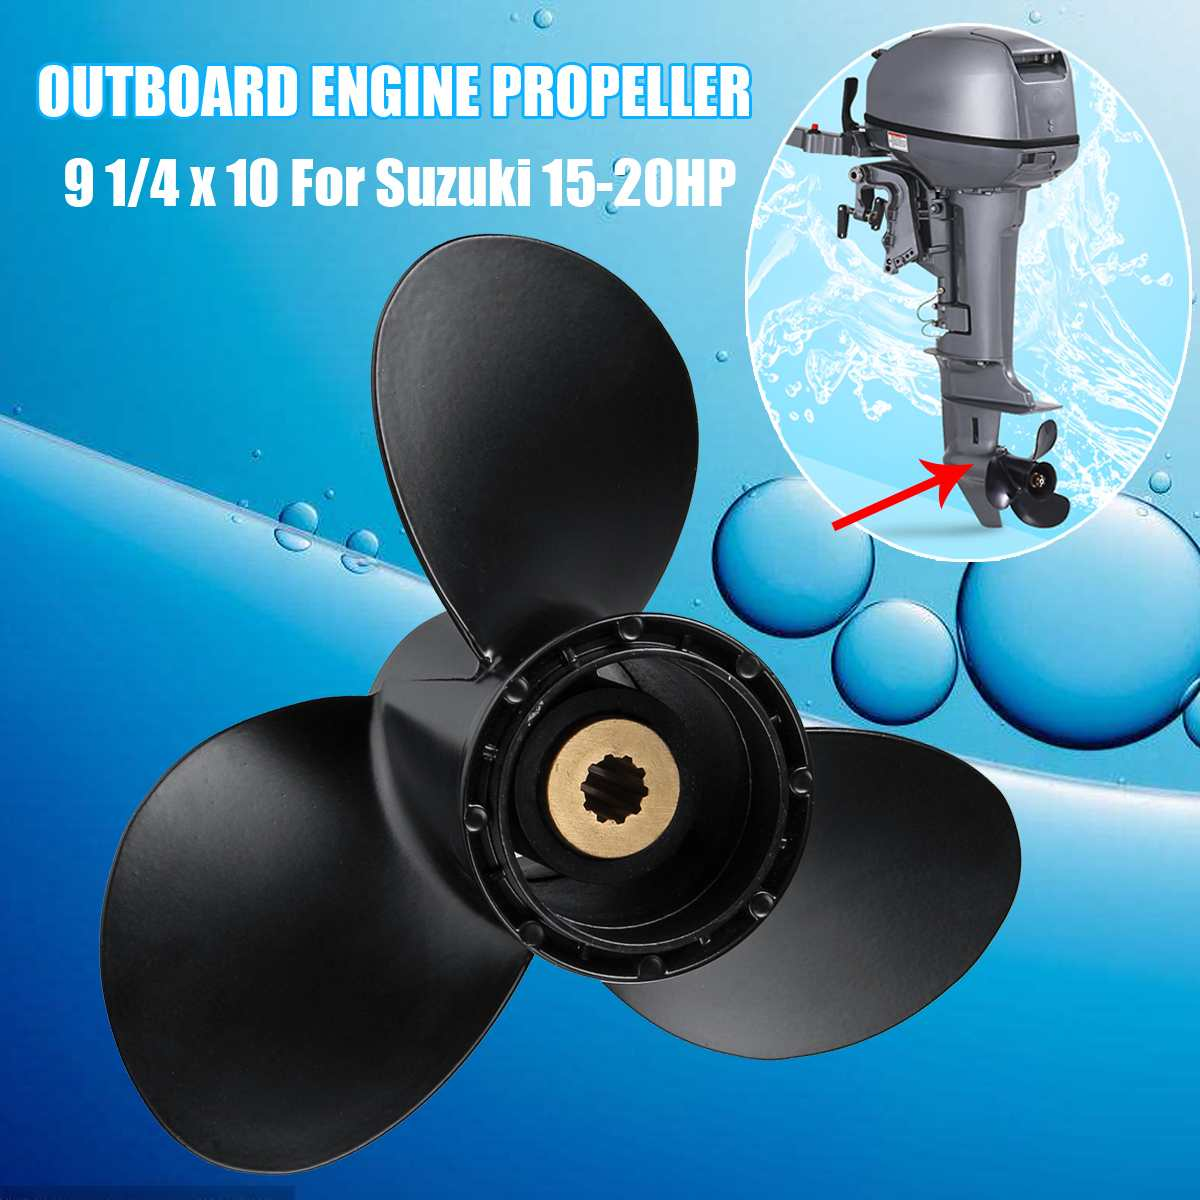 Marine Boat Engine Propeller 9 1/4 x 10 Outboard Engine Propeller For Suzuki 15 20HP